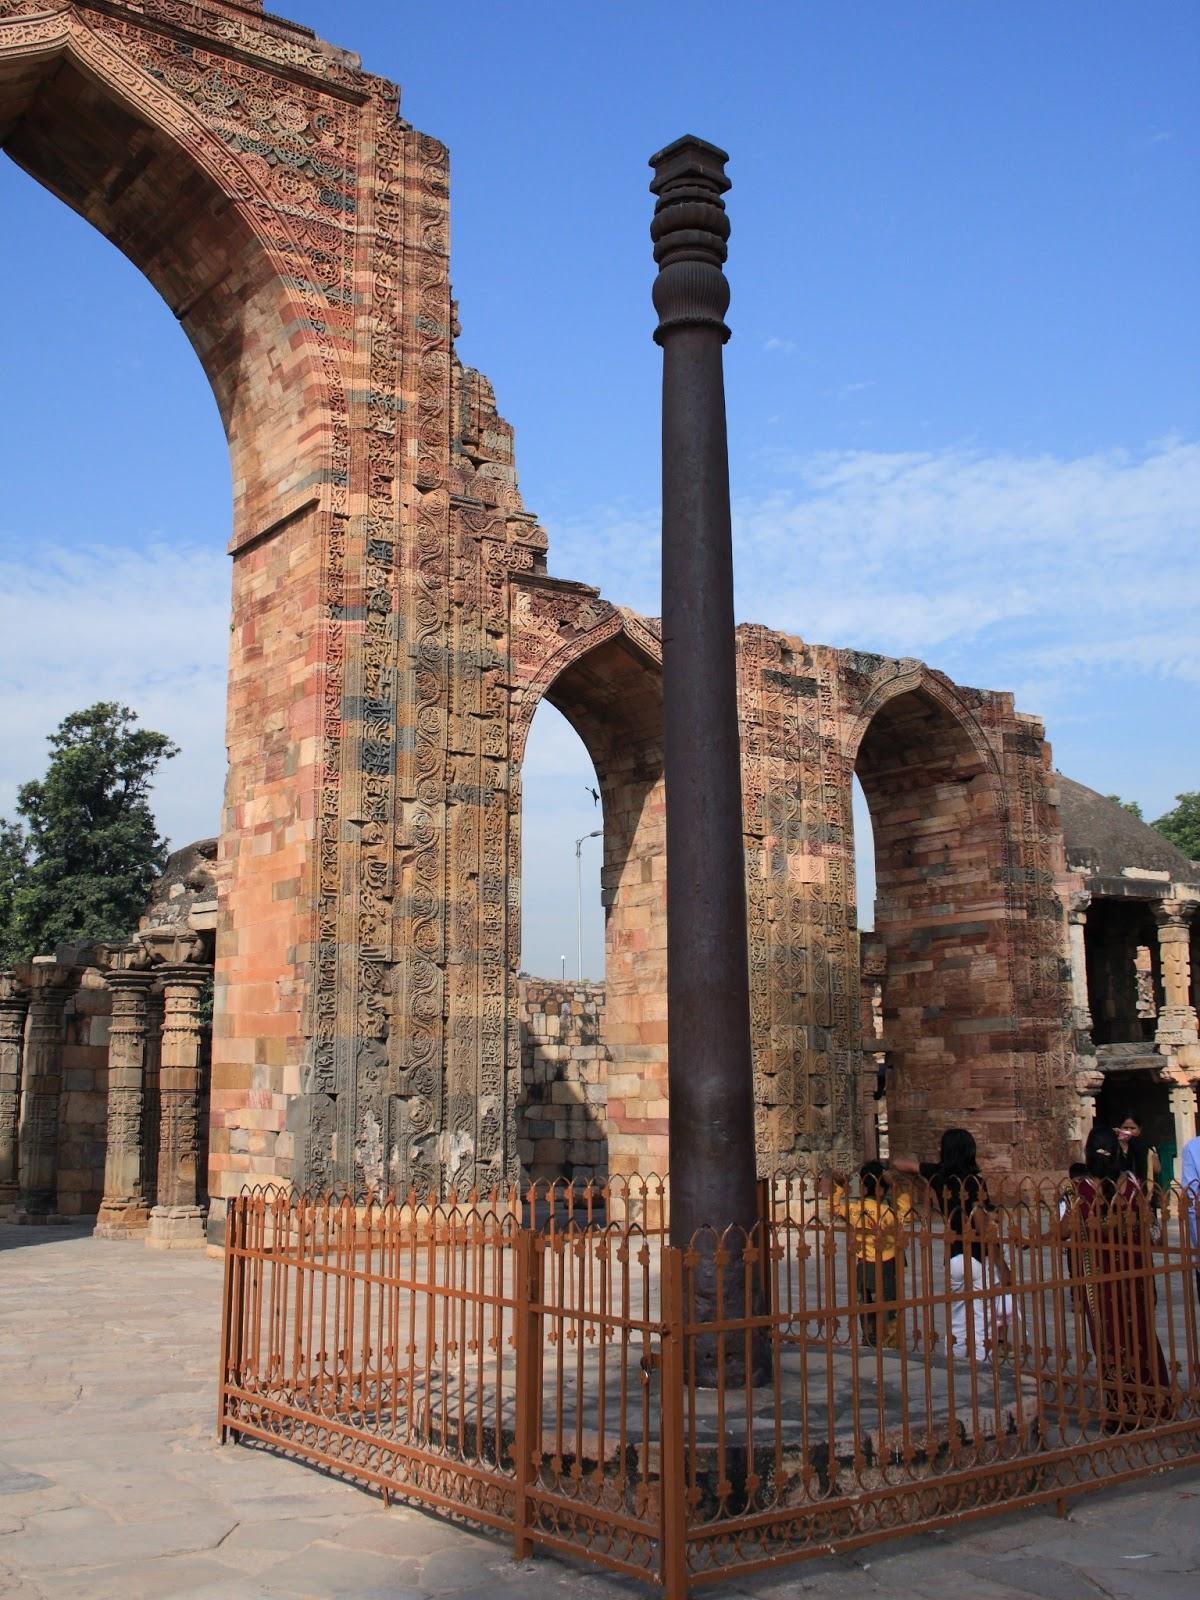 Jacob S Delhi The Qutub And Its Surroundings